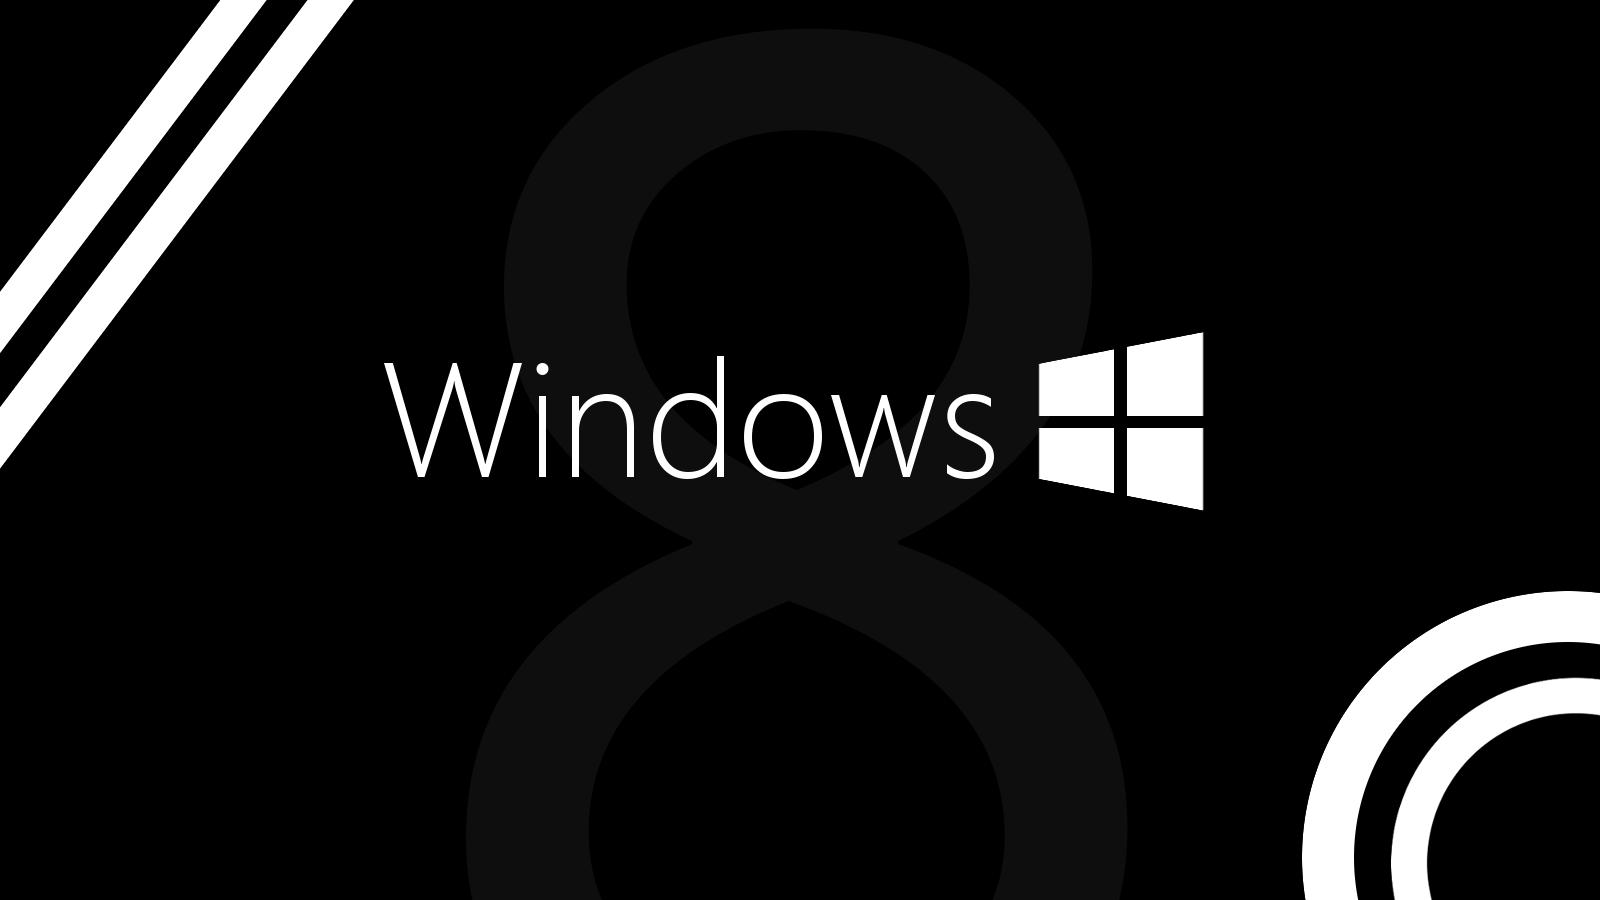 Windows 8 Black Wallpapers Wallpaper Cave